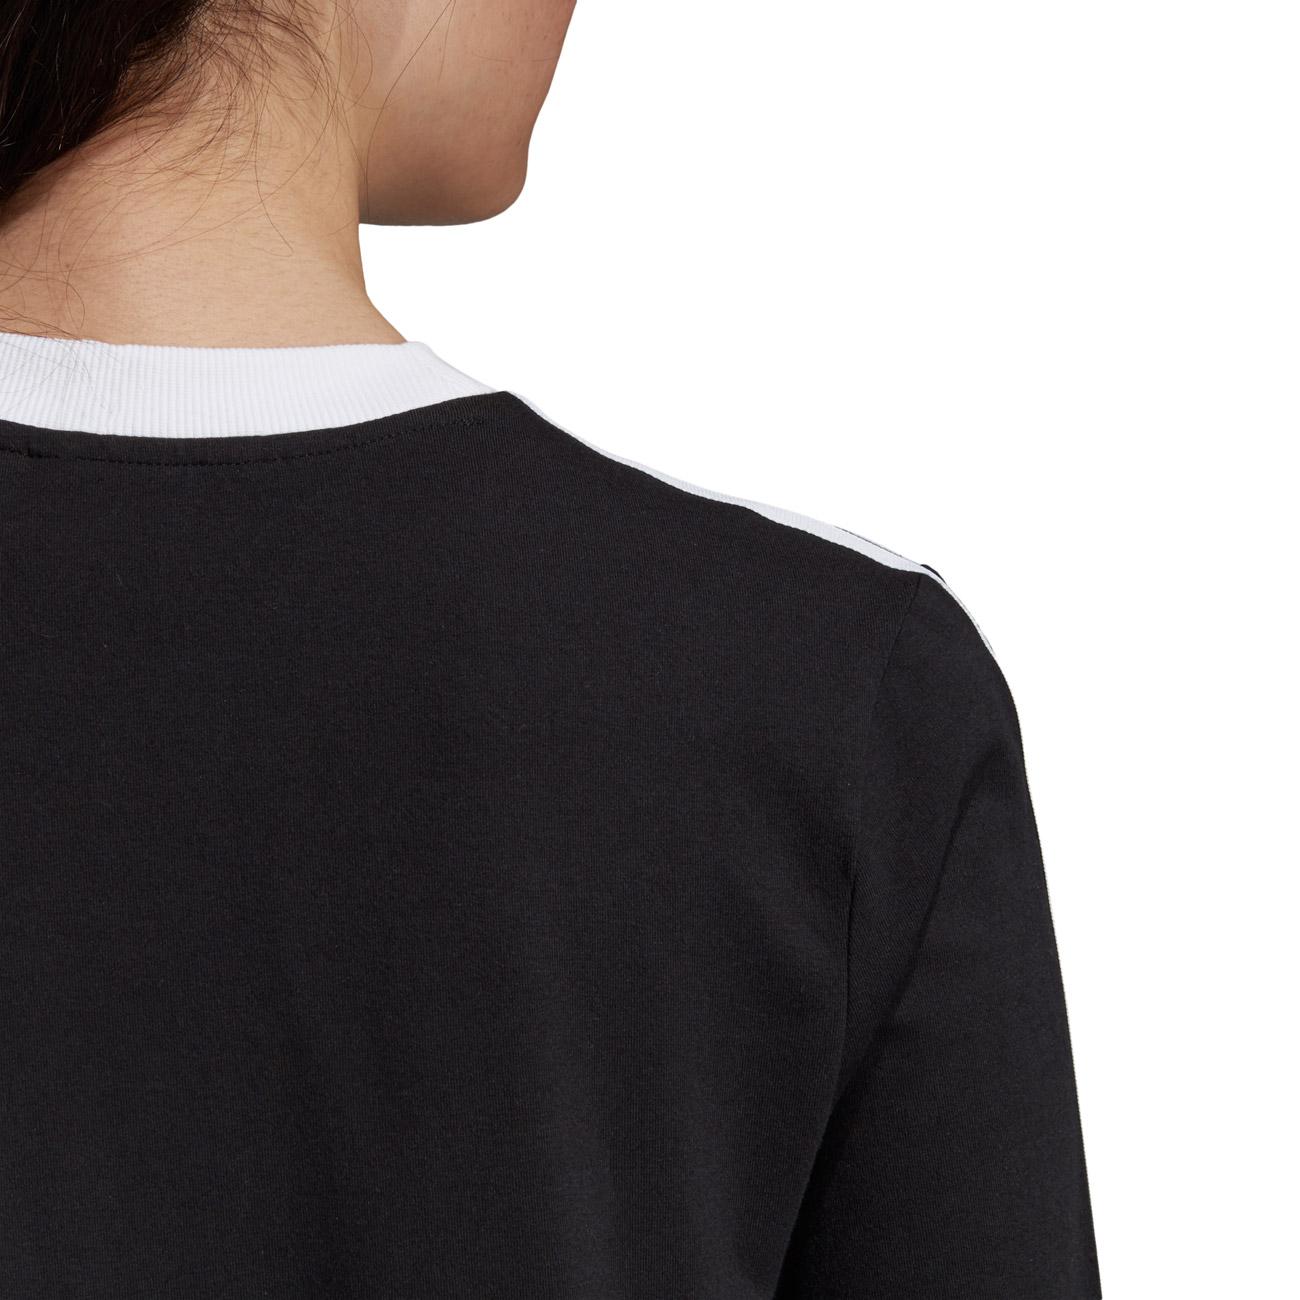 Adidas Originals Damen T Shirt 3 STR LS TEE